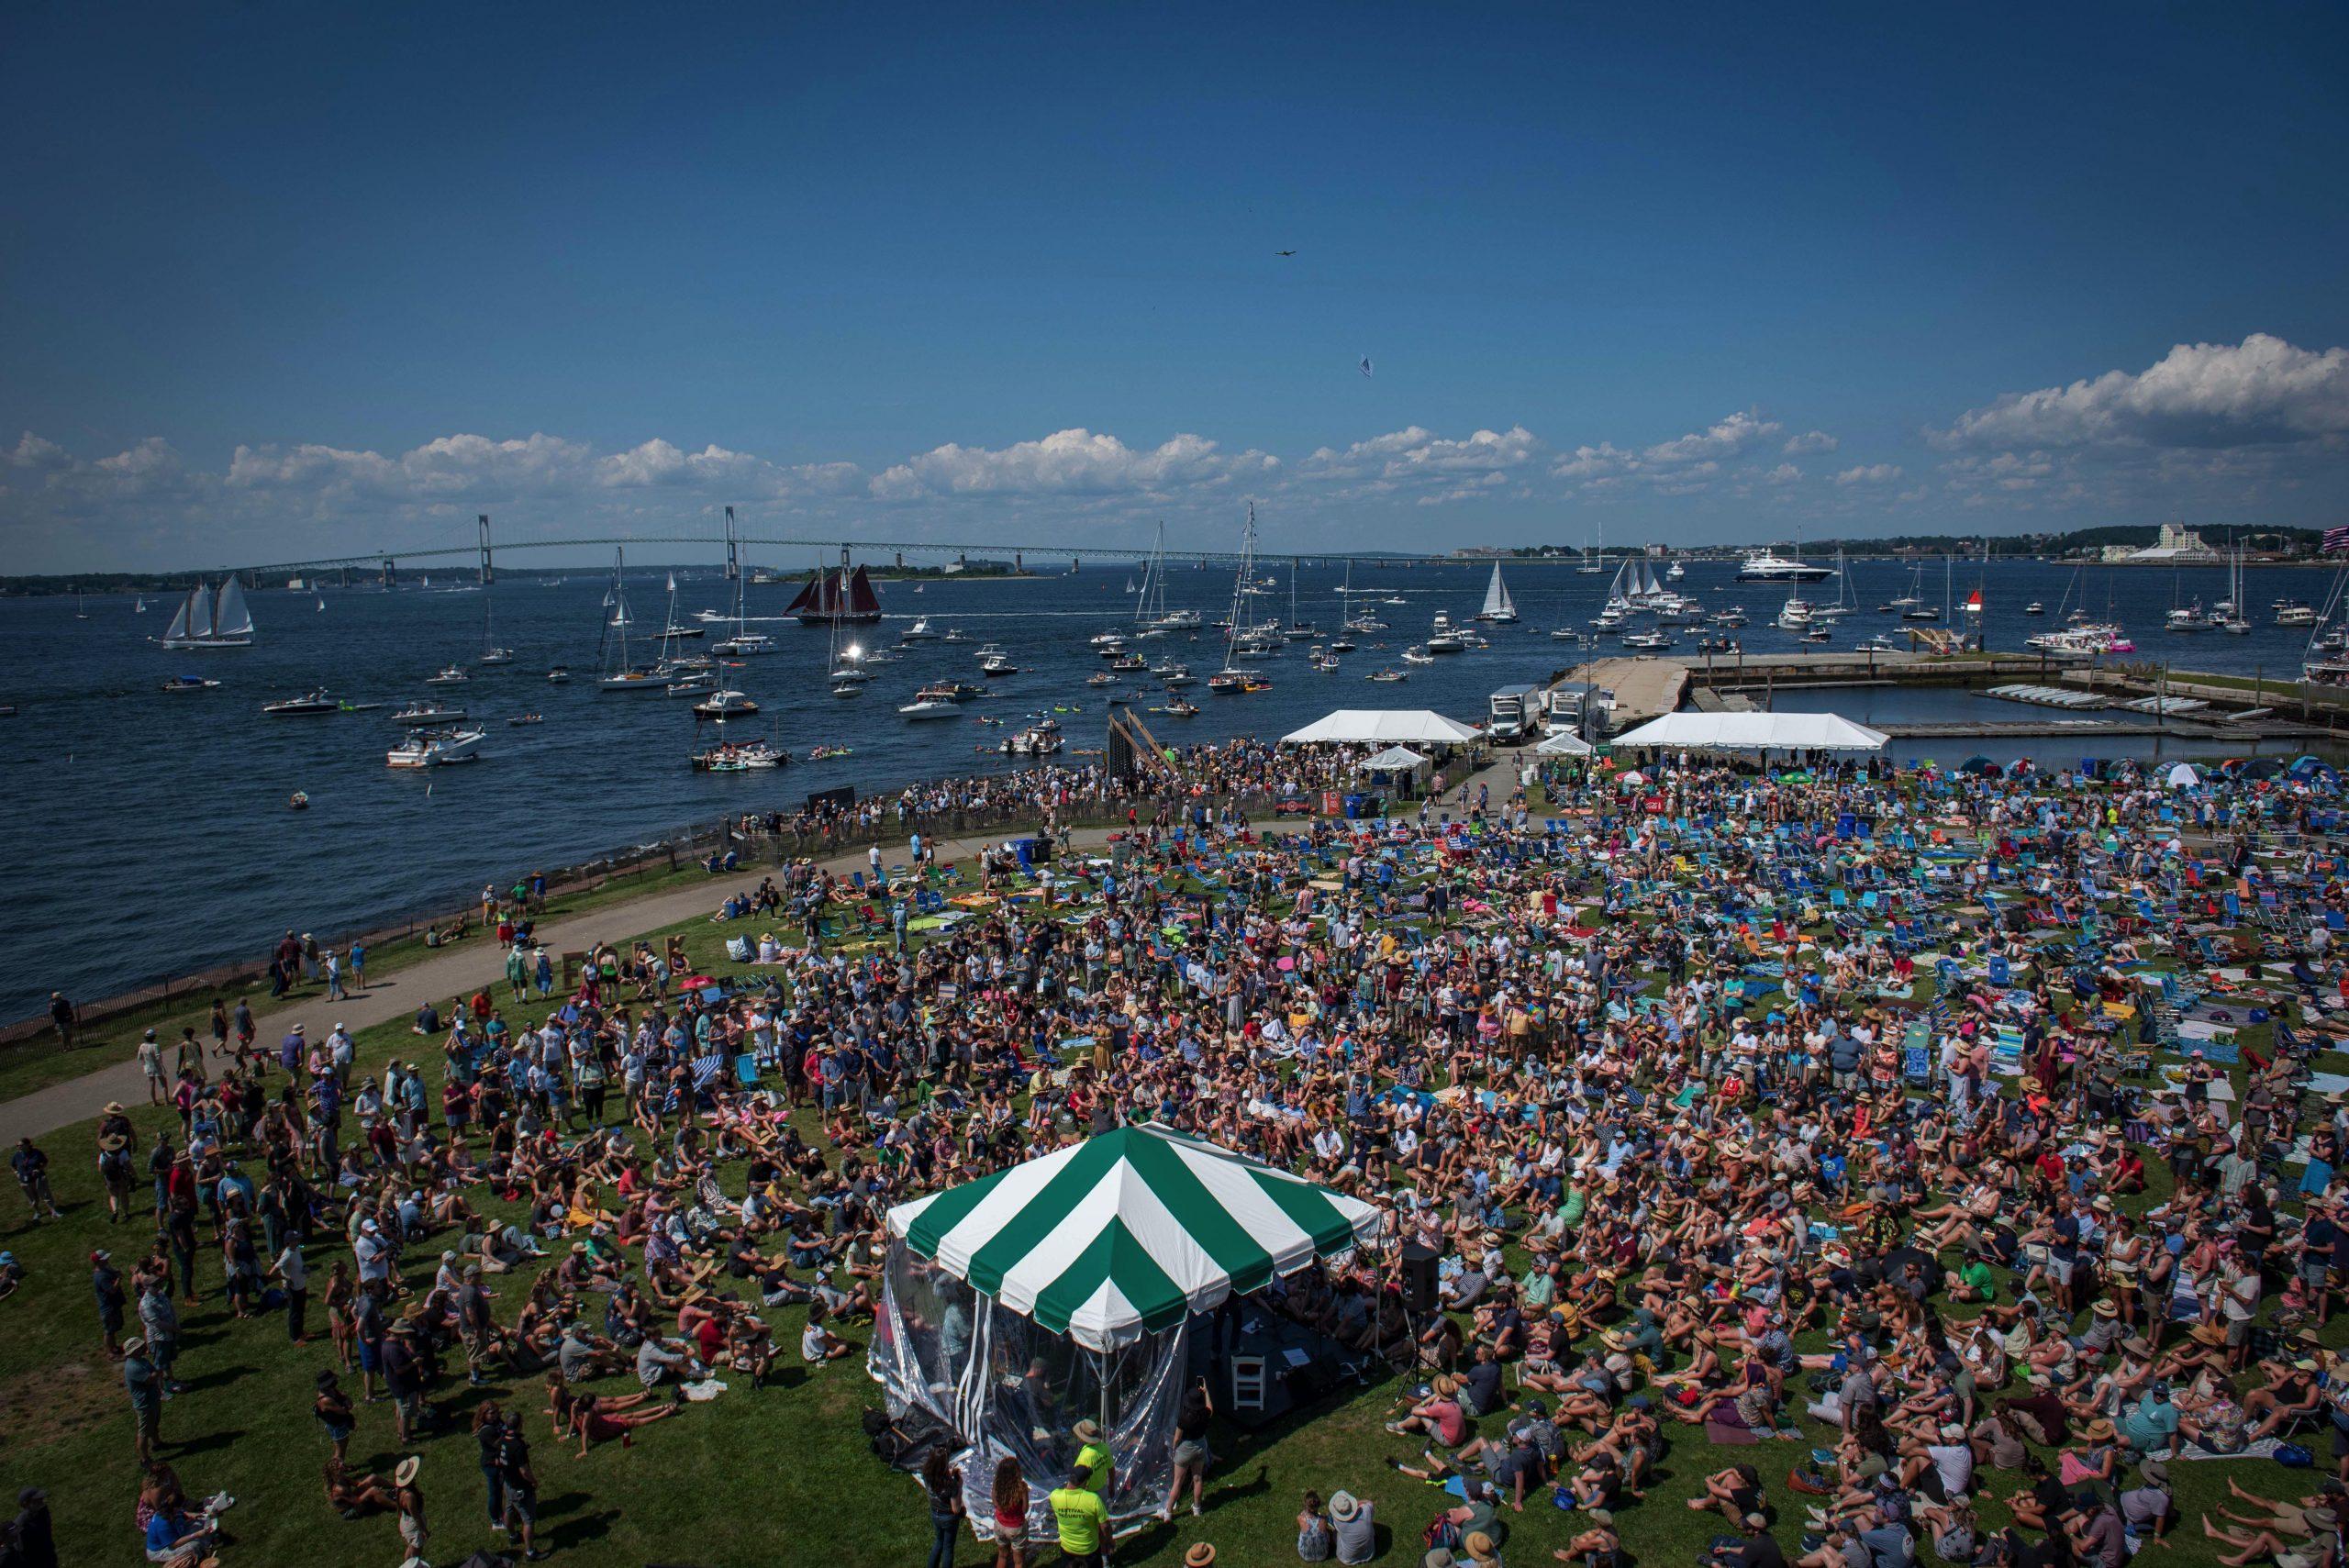 Newport Folk 2021 Was A Warm, Quiet Welcome Back To Festival Season